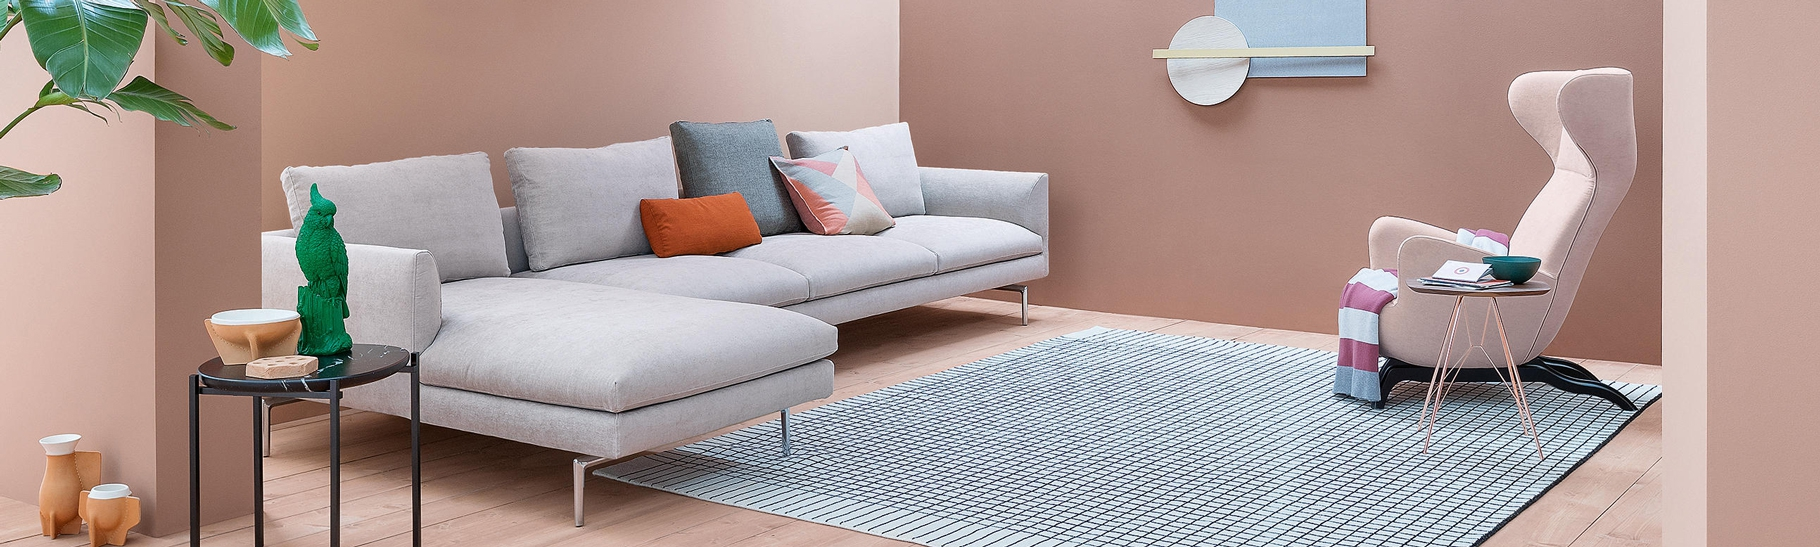 Zanotta   DomésticoShop Designer Furniture on chaise recliner chair, chaise sofa sleeper, chaise furniture,